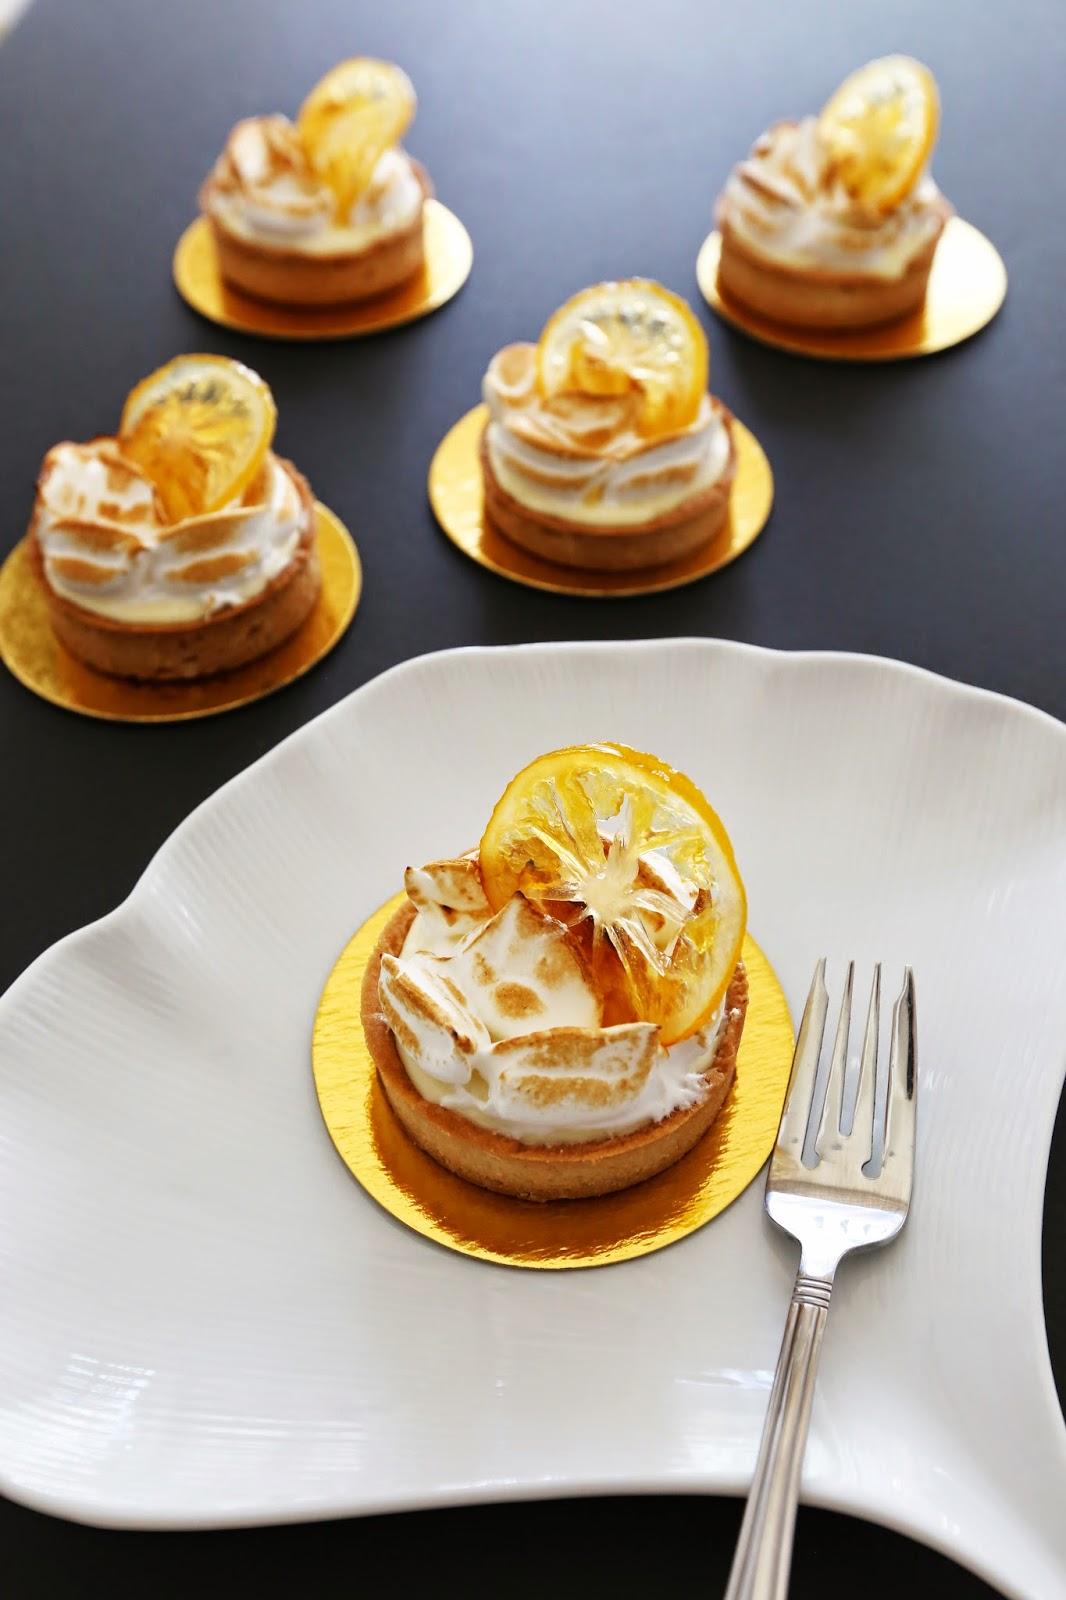 Gourmet Baking: Meyer Lemon Tart with Candied Lemon and Peel